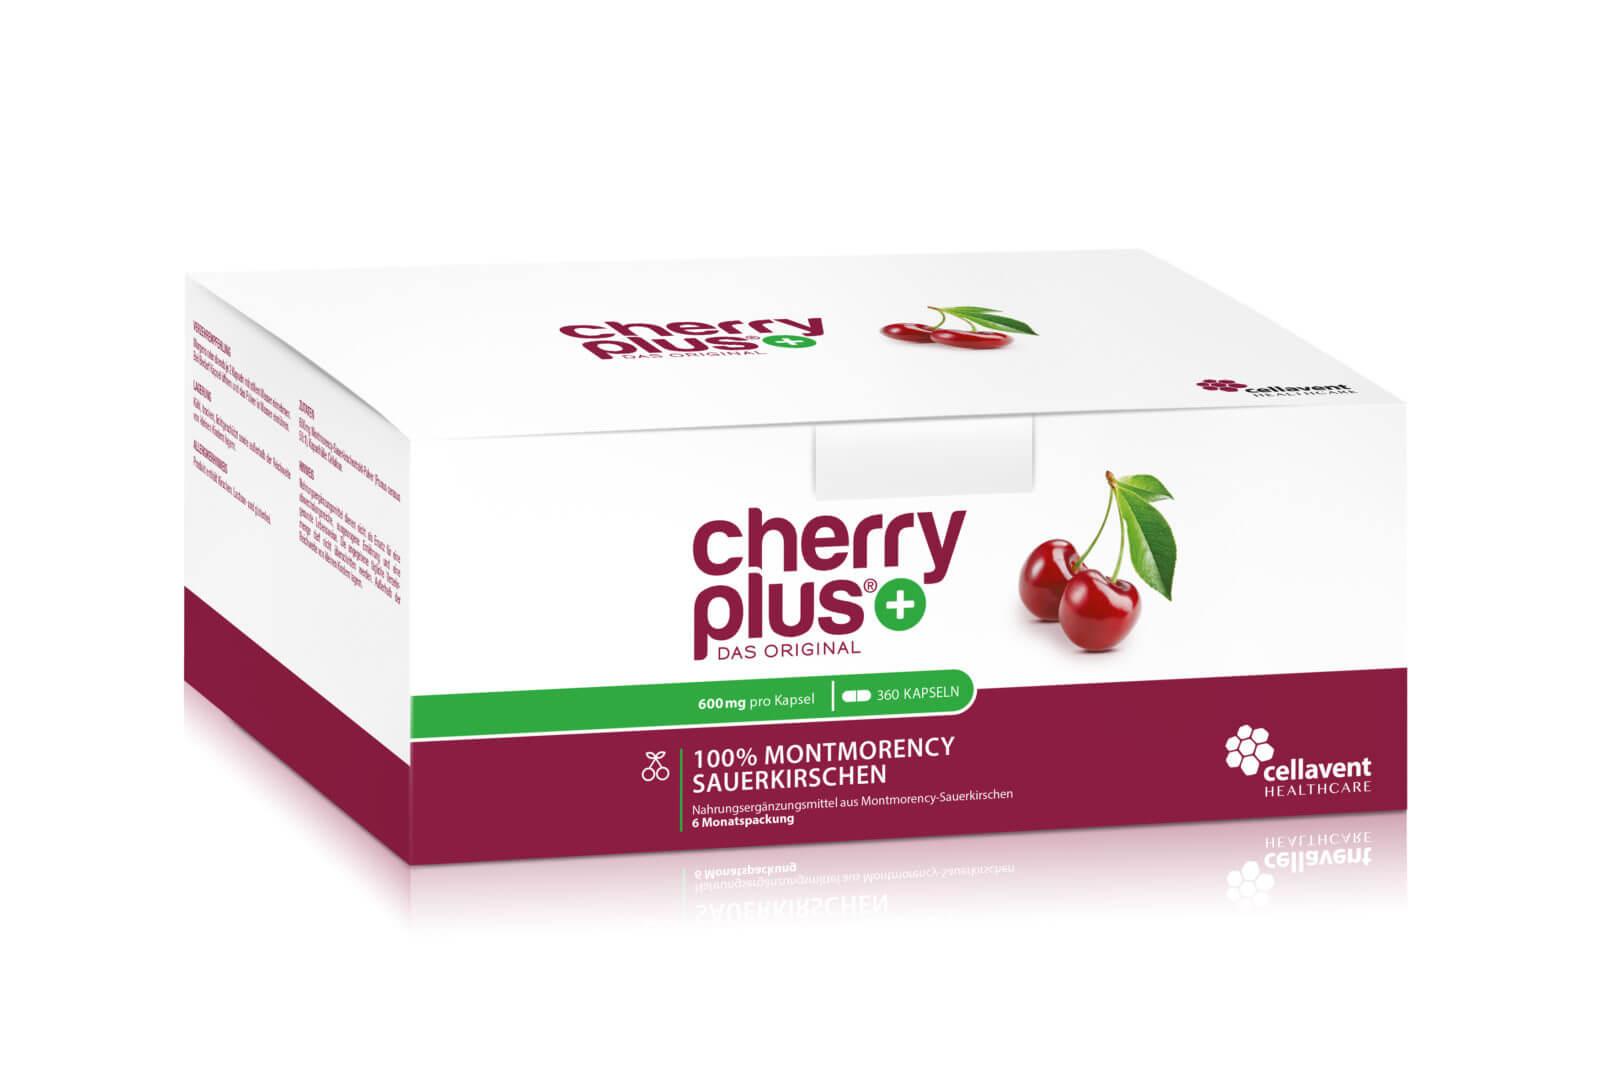 montmorency-sauerkirsche-kapseln-cherry-plus-360-stueck-umverpackung-6er-vorne-1200x1200